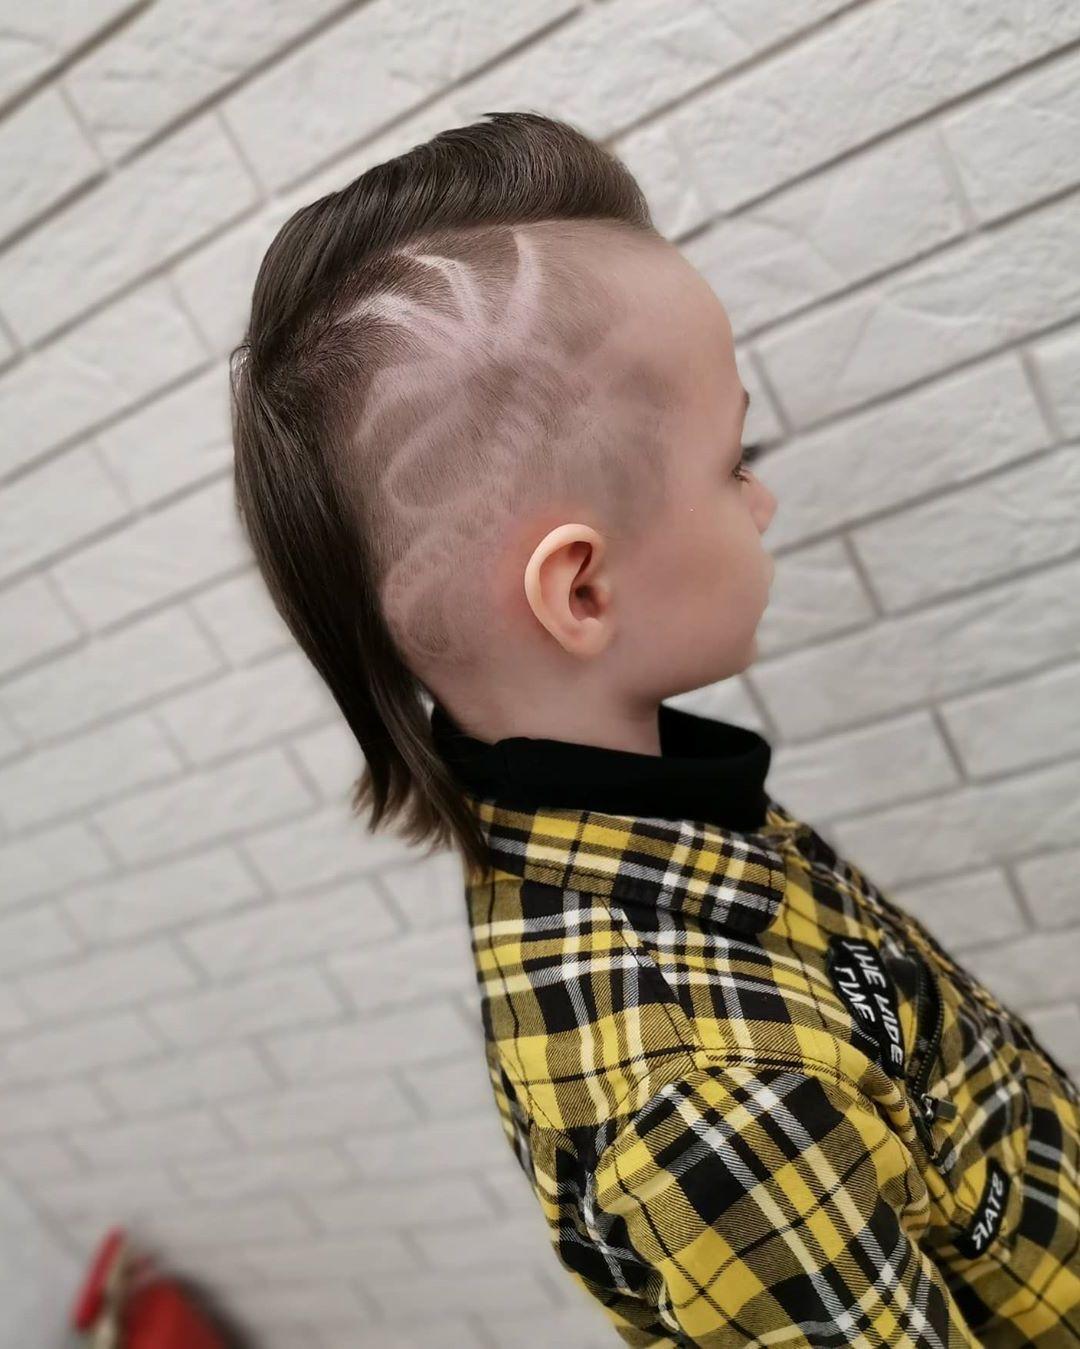 Long Undercut Cut for Boys with Alien Design - side view